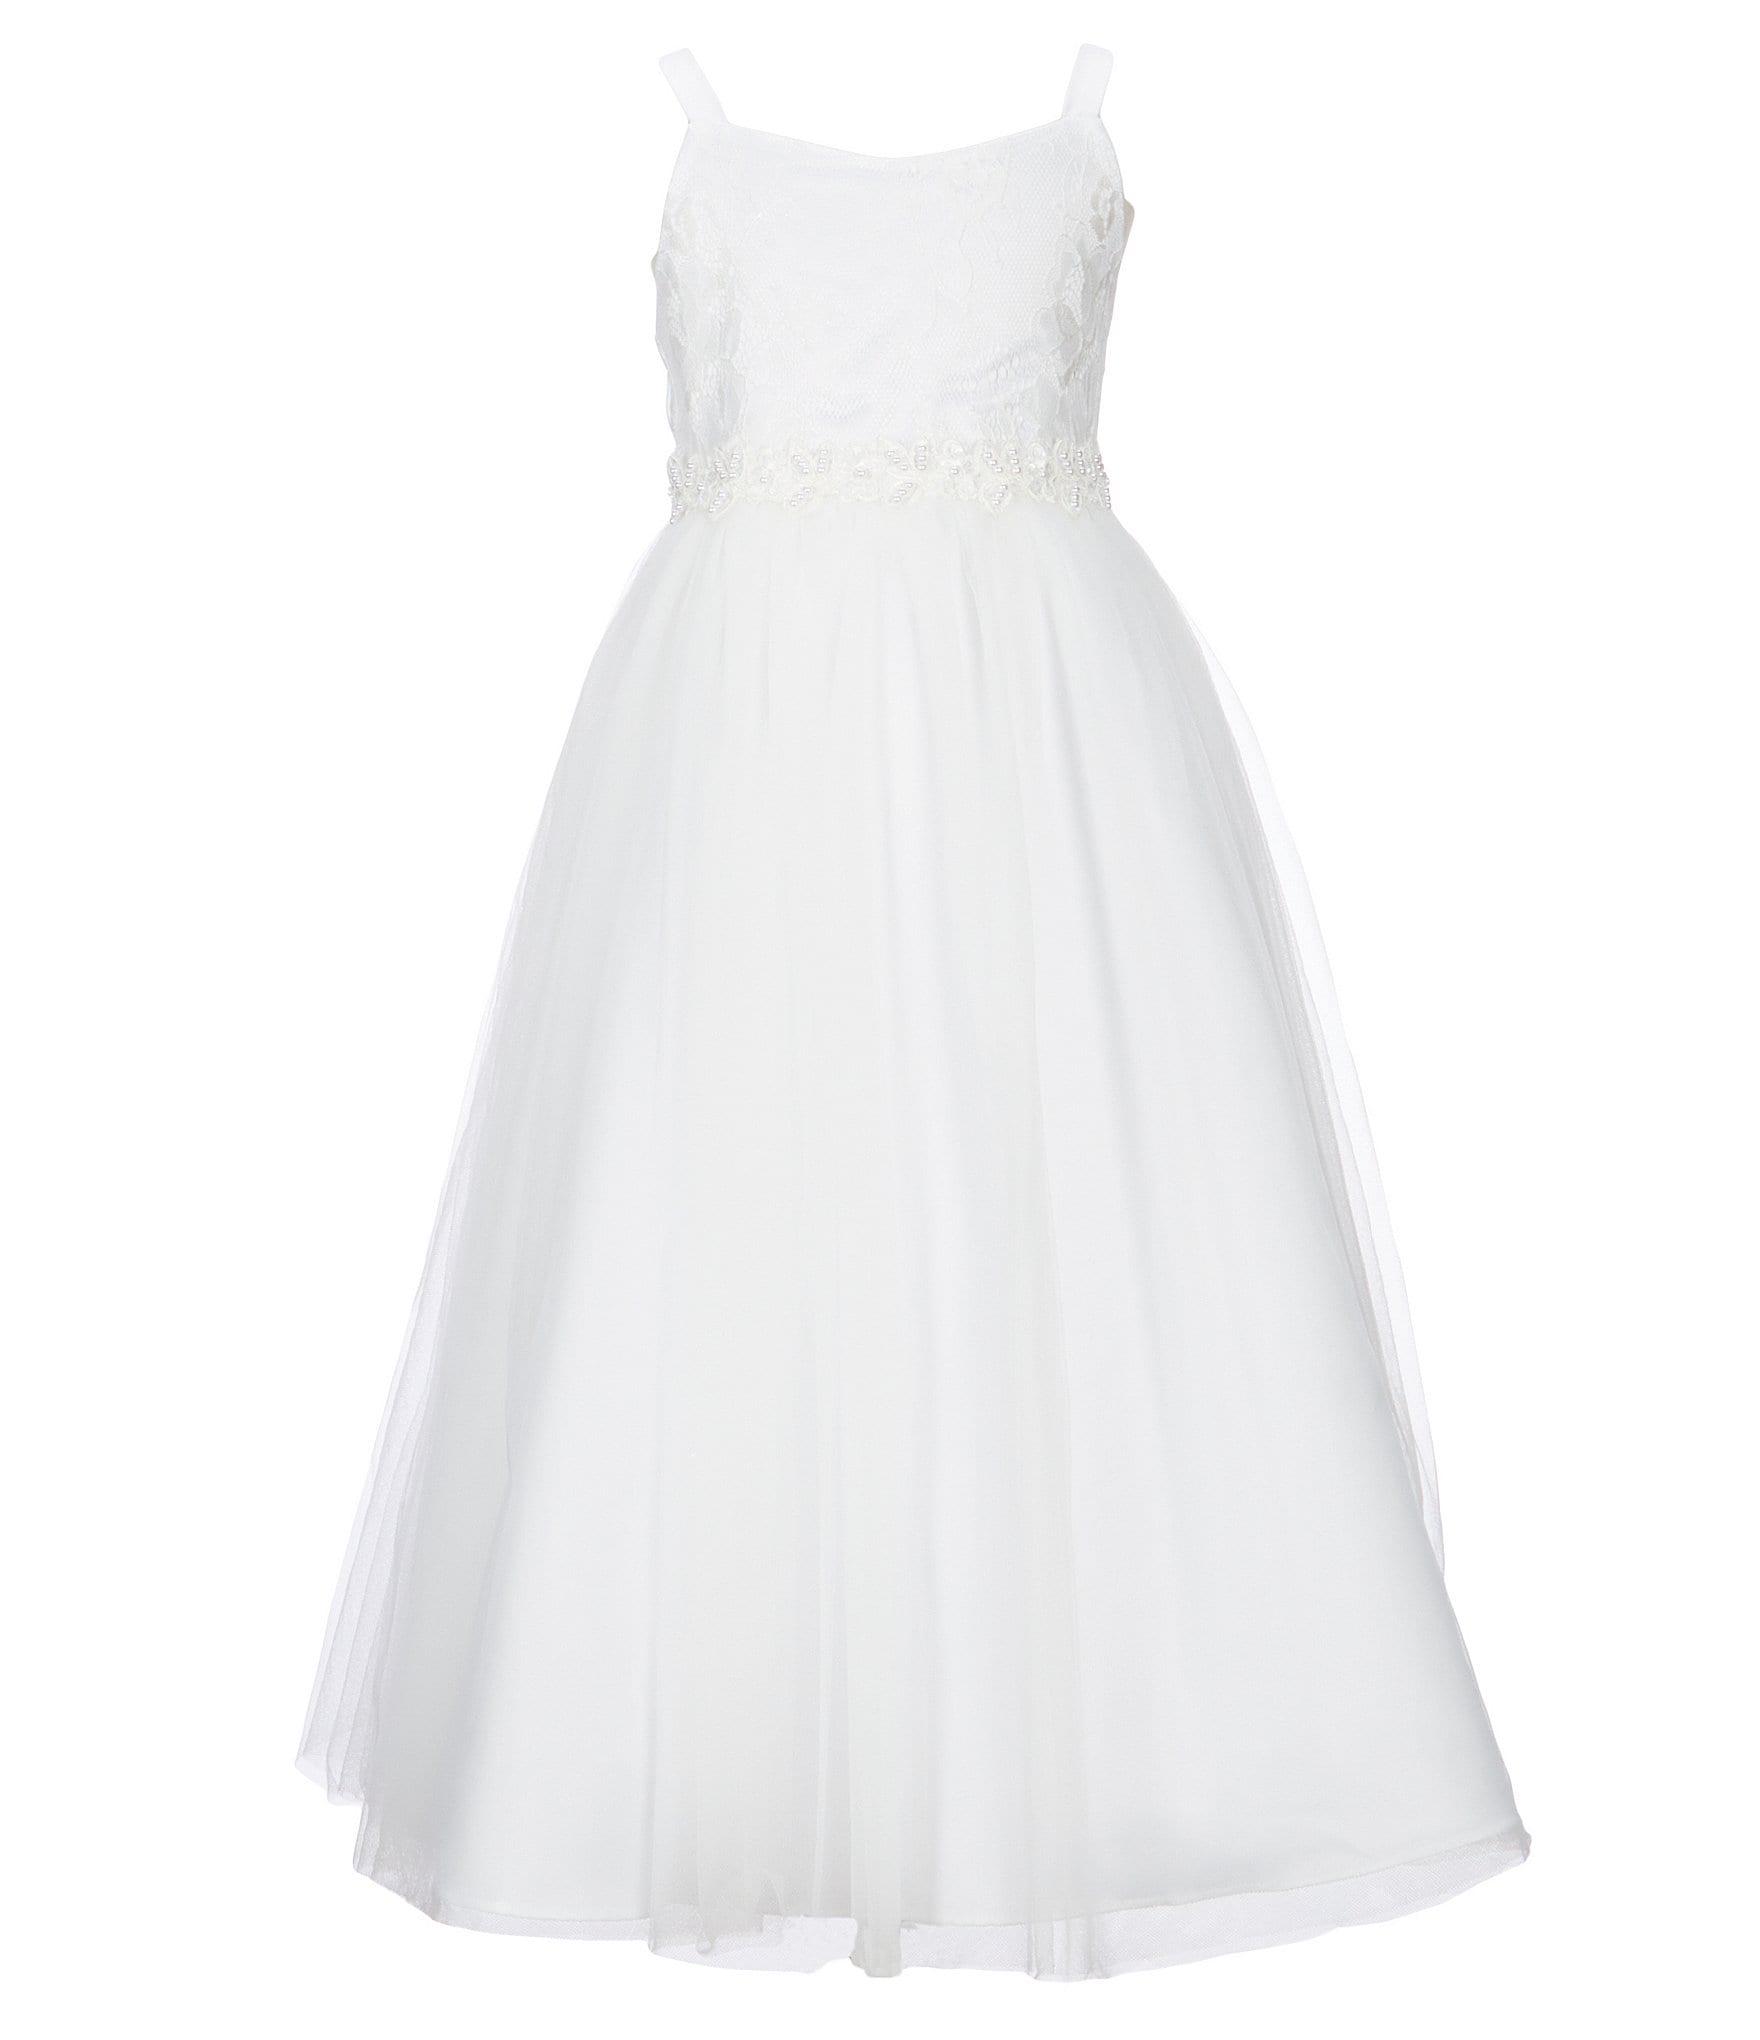 690c7e8bf8da toddler girls dresses | Dillard's